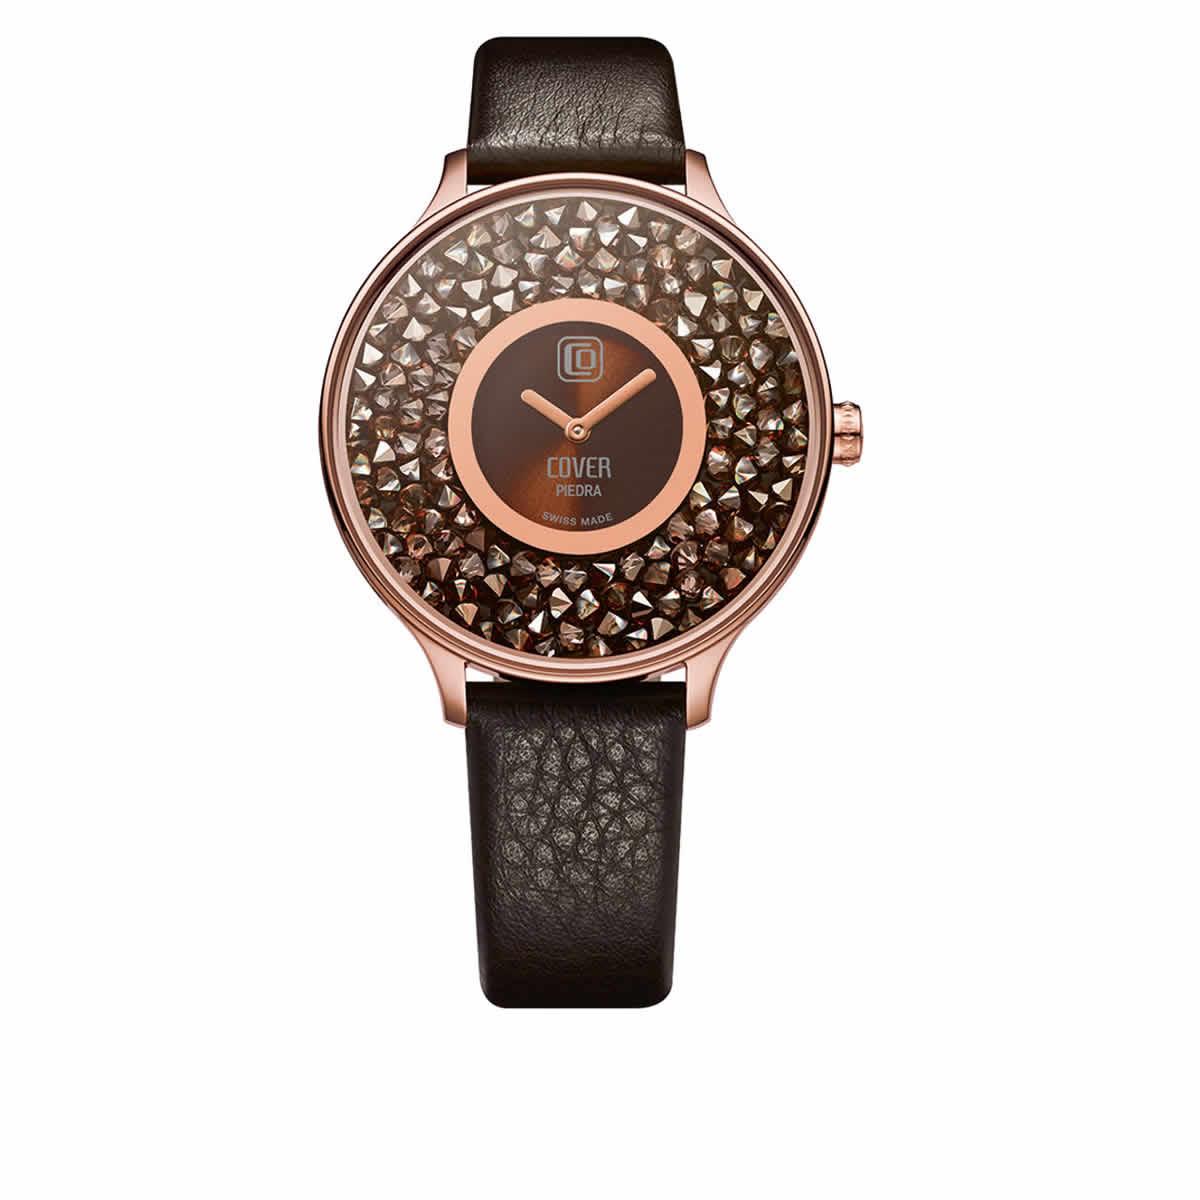 COVER(コヴァ) TREND PIEDRA CO158.07 ダークブラウン 女性用腕時計